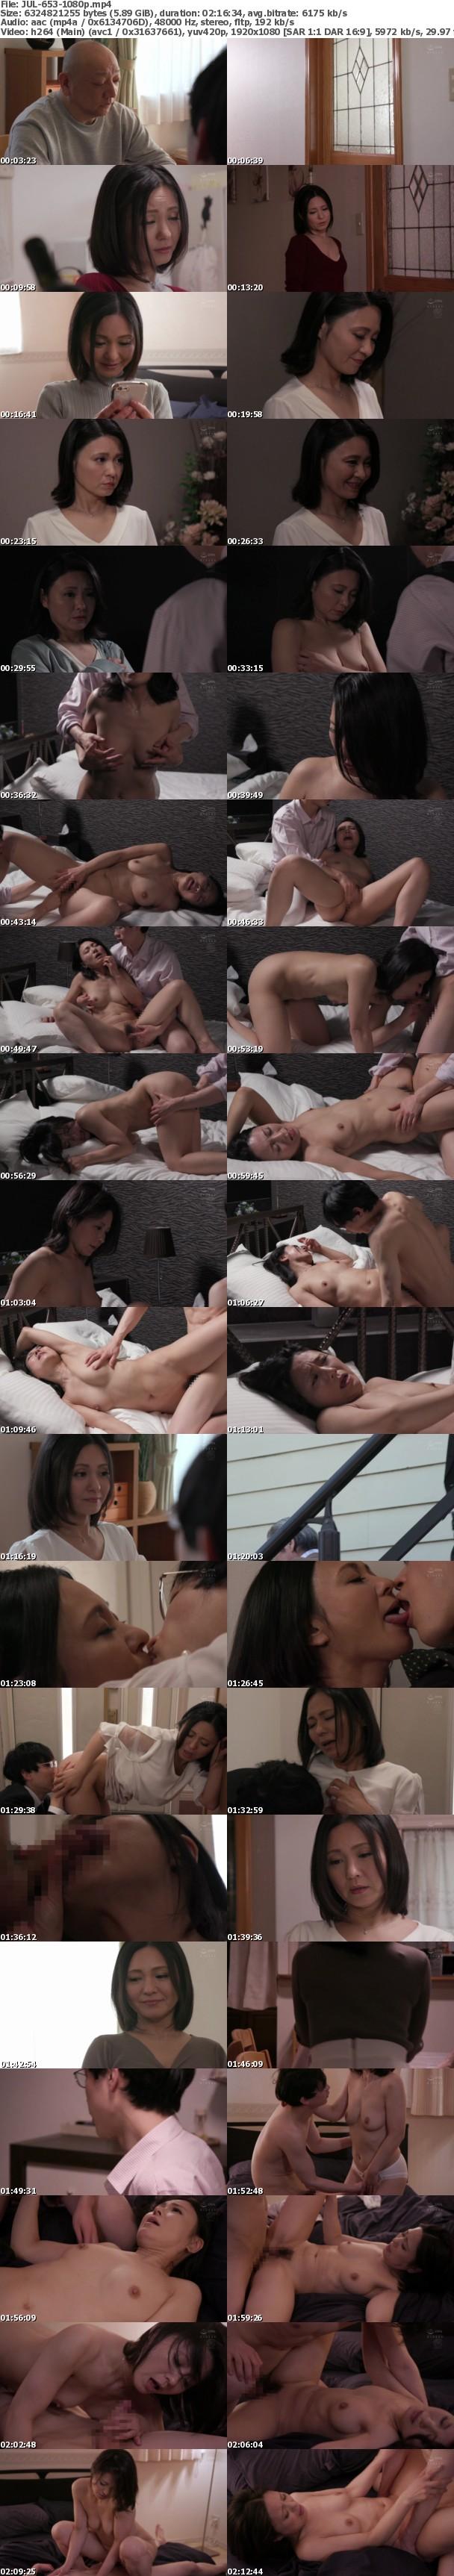 (Full HD) JUL-653 「ねぇ?あなた、本当に童貞なの?」~童貞詐欺にイカされ続けた人妻~ 綾瀬麻衣子